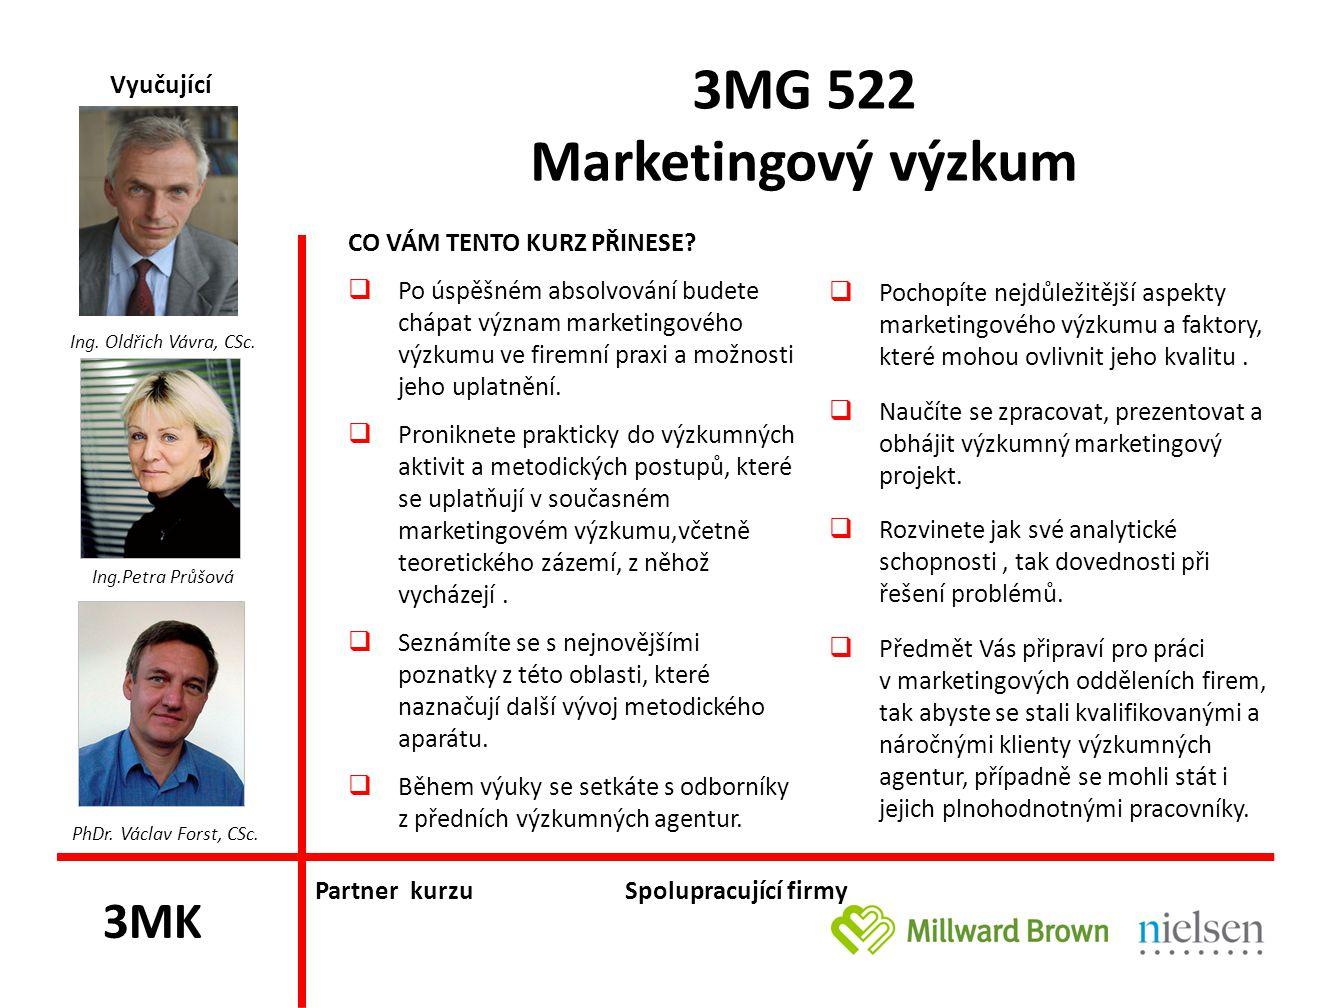 3MG 522 Marketingový výzkum